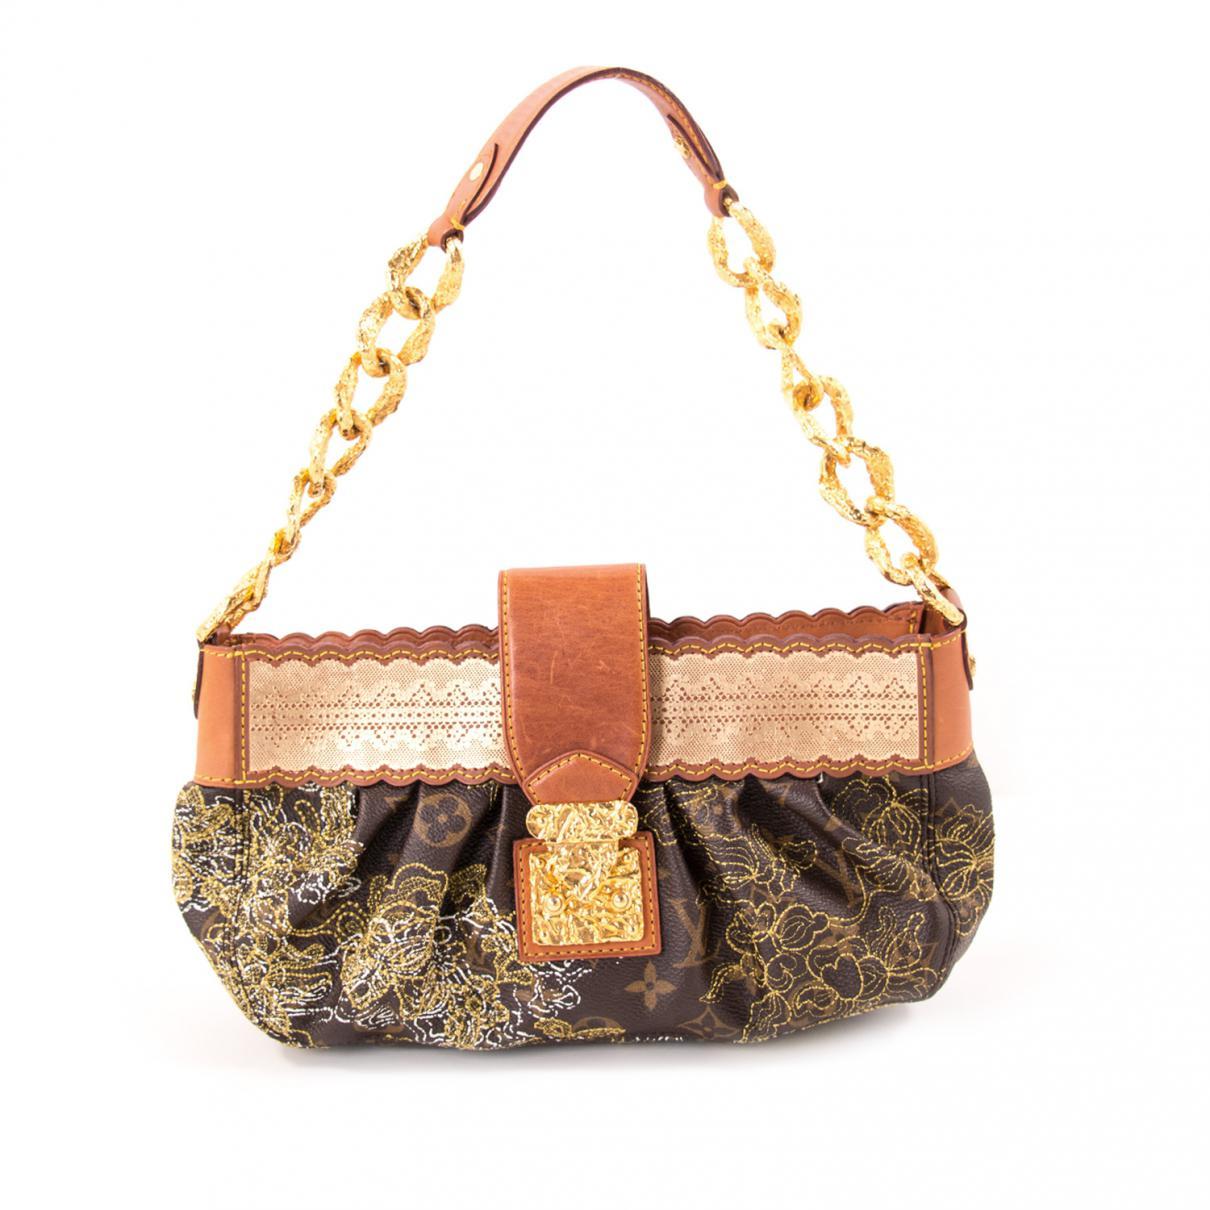 Pre-owned - Patent leather mini bag Louis Vuitton mqxzSDQO